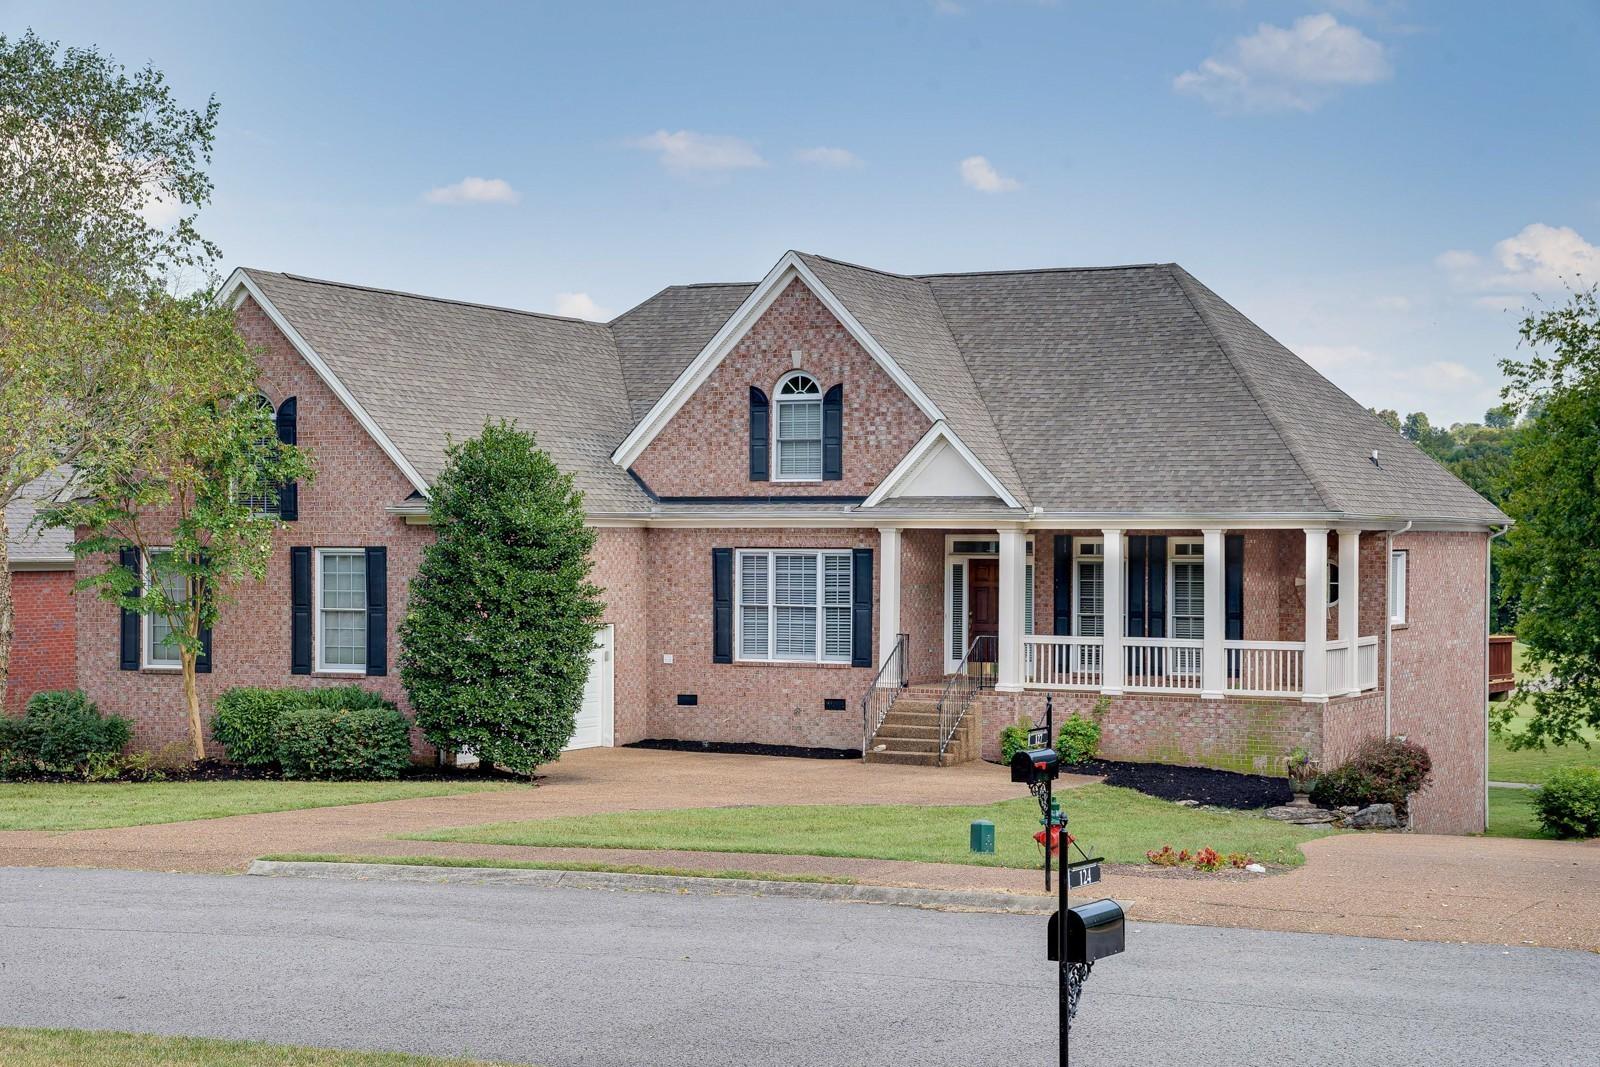 125 Joshuas Run, Goodlettsville, TN 37072 - Goodlettsville, TN real estate listing